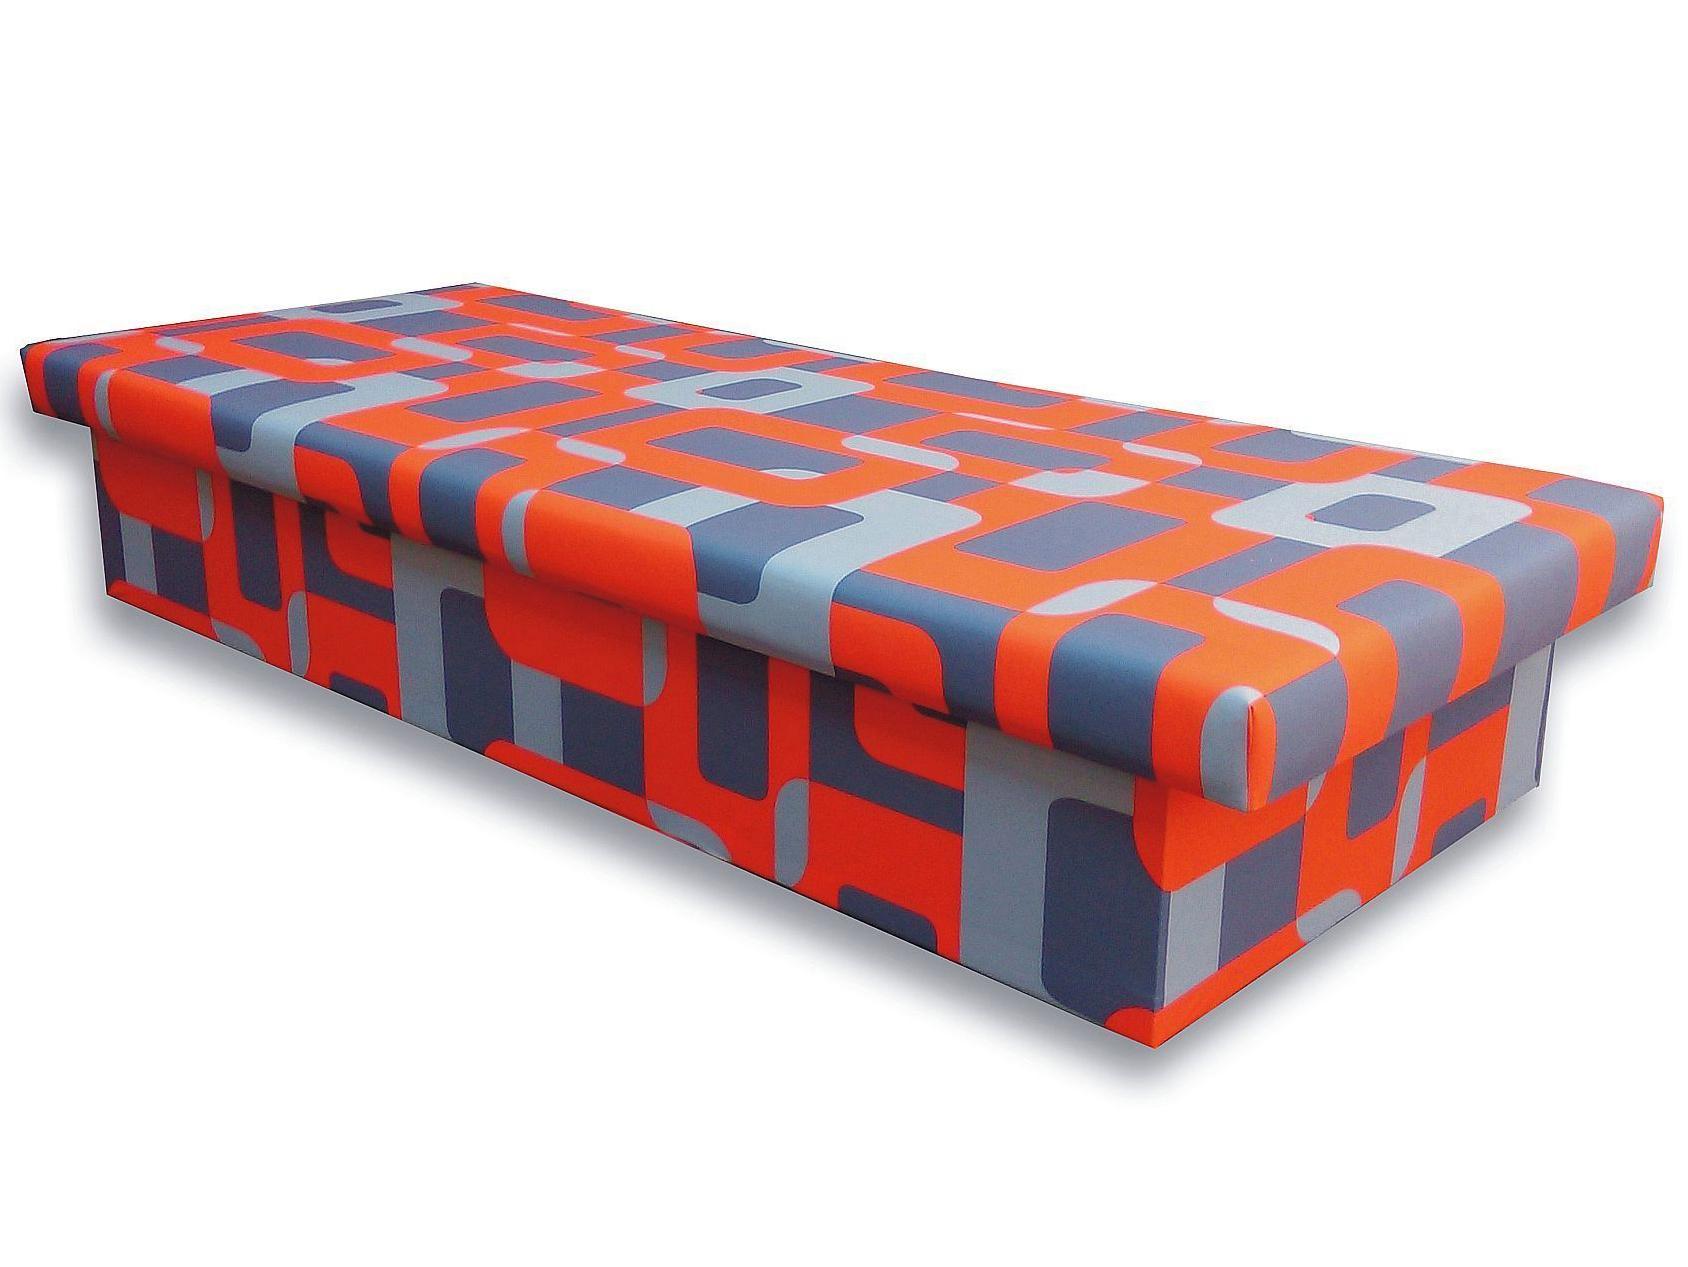 Jednolôžková posteľ (váľanda) 90 cm Jana 10 (Gusto 6A oranžová)